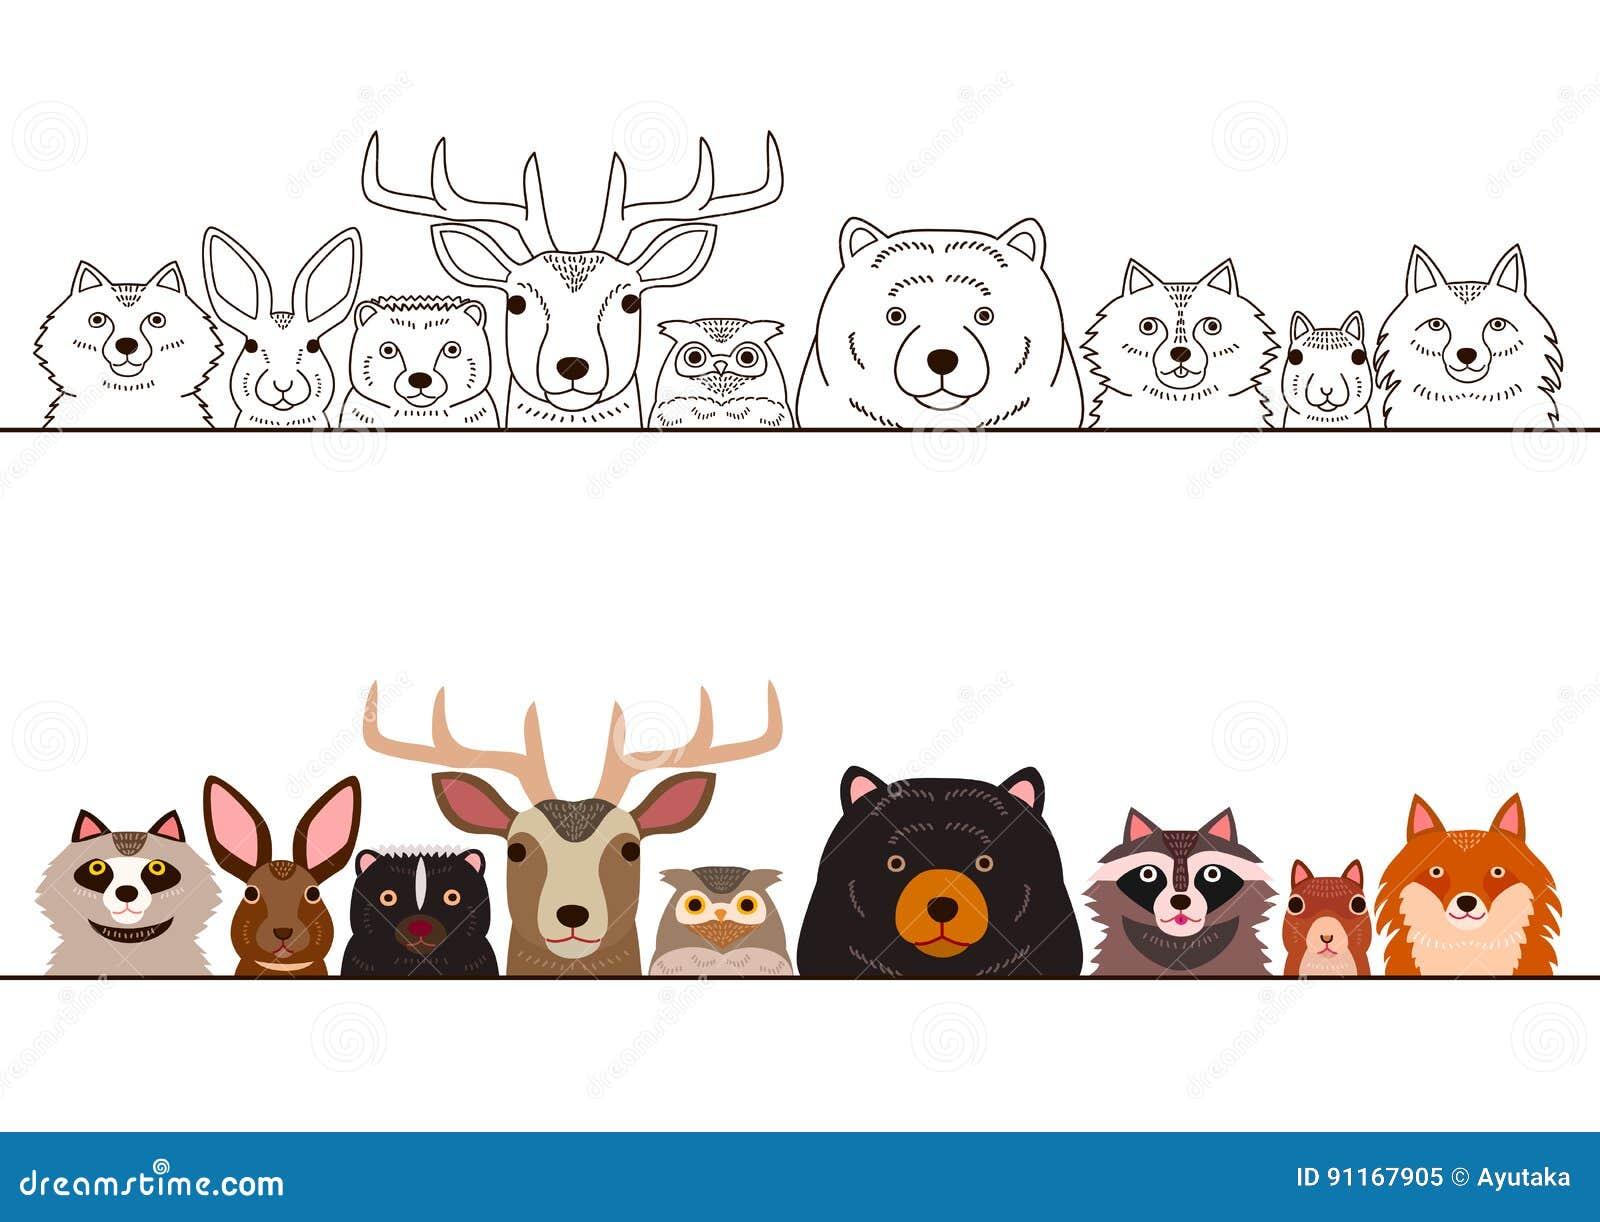 Line Drawings Of Woodland Animals : Woodland animals border set stock vector illustration of